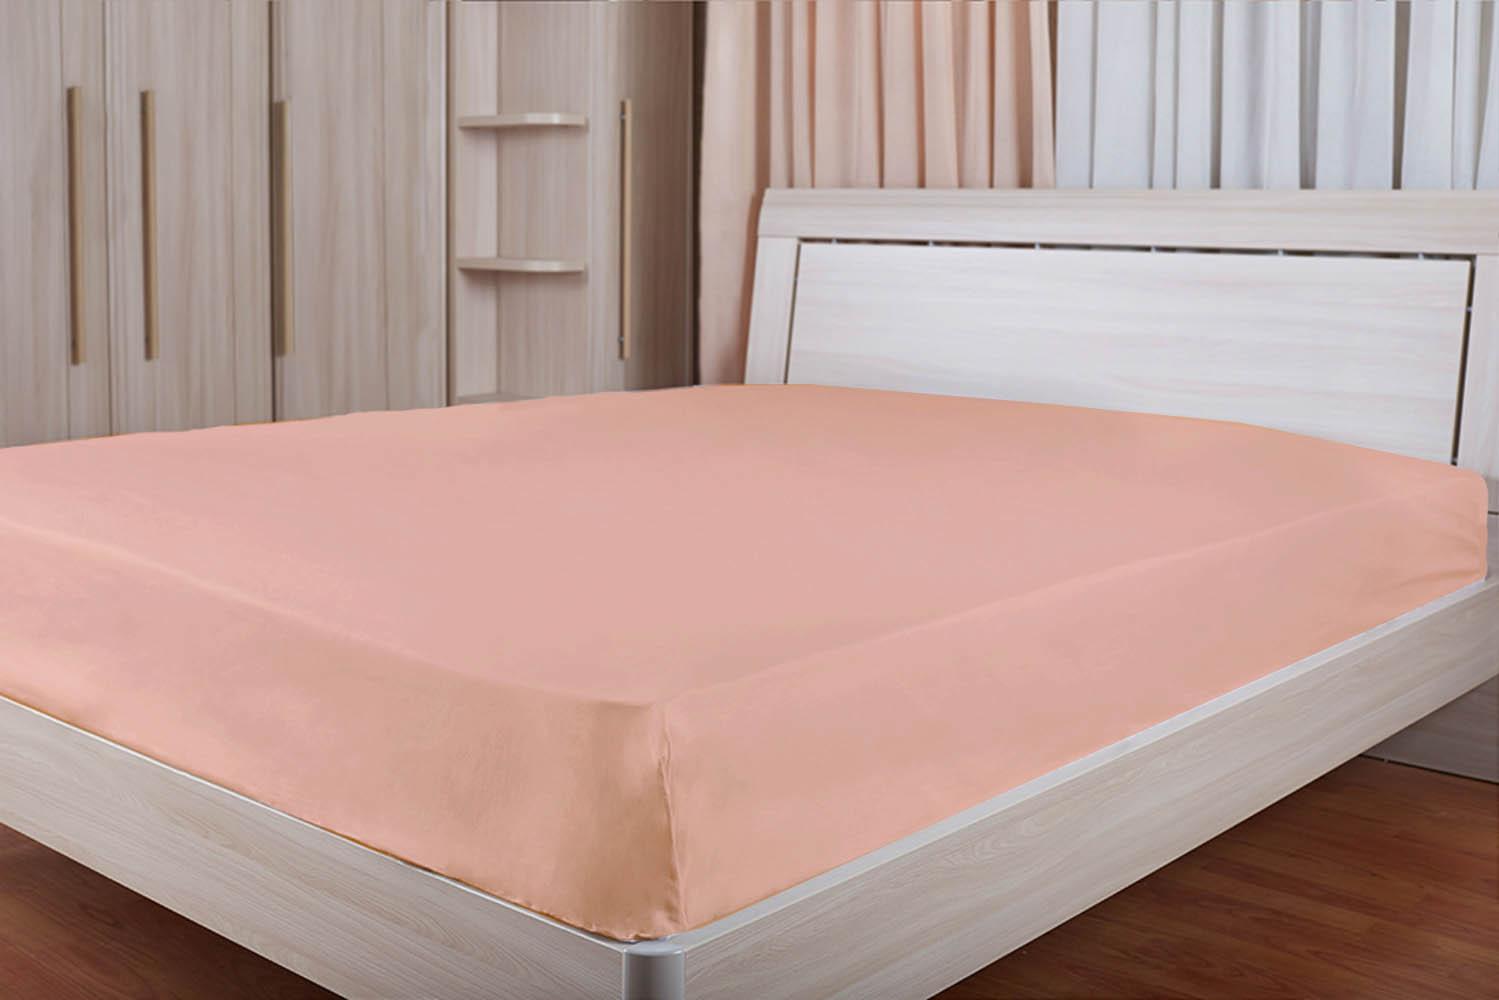 {} Primavelle Простыня Nikki Цвет: Розовый (150х215) vikki nikki футболка кошкины эмоции